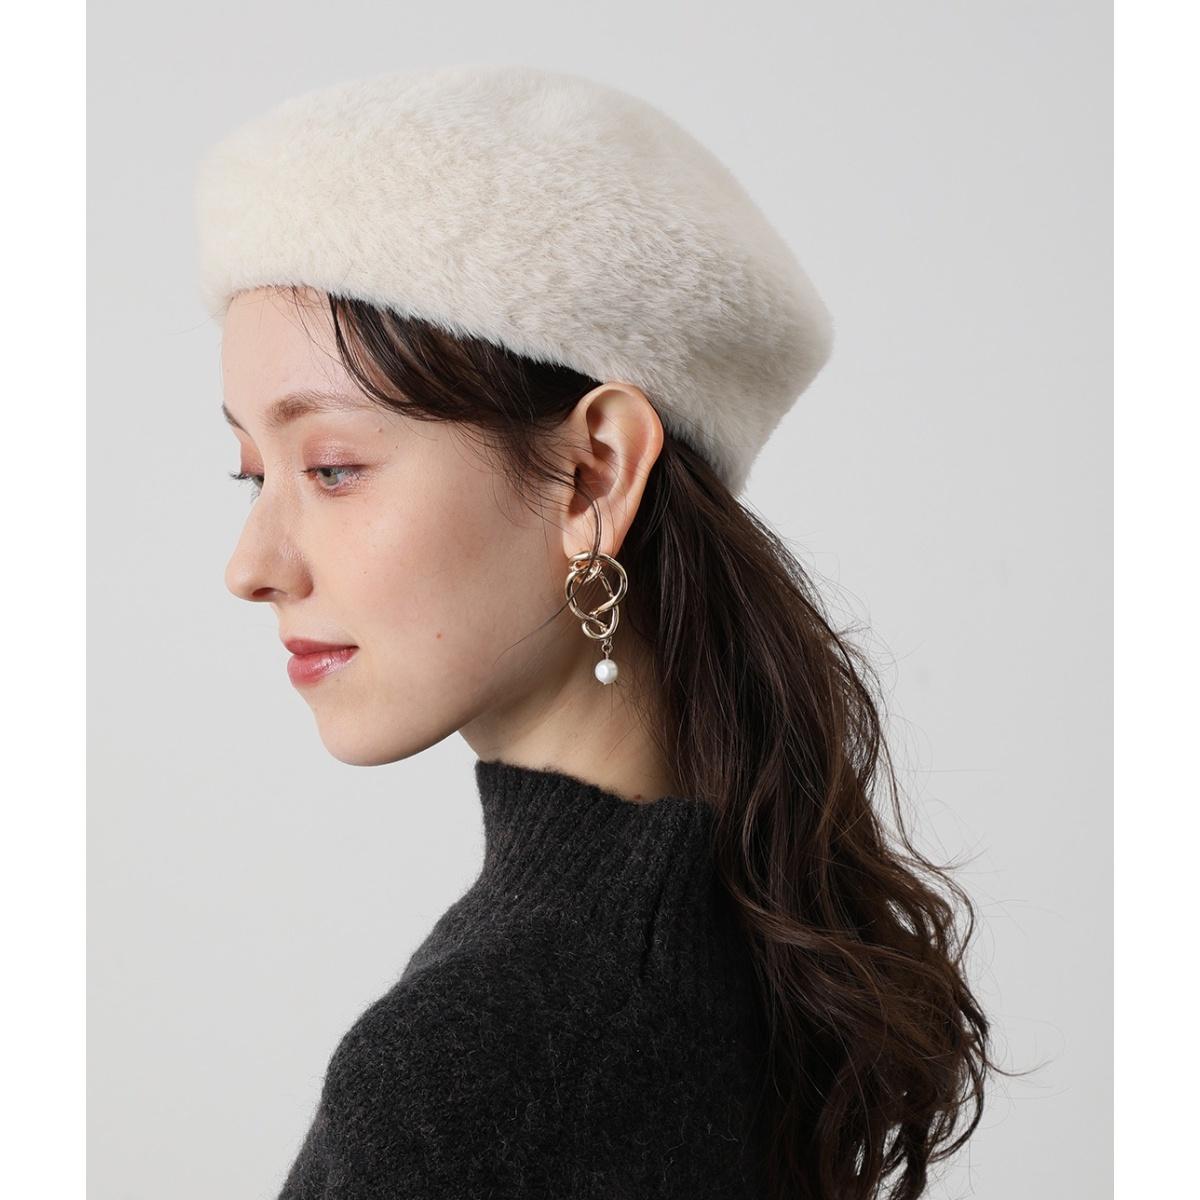 SALE ハンチング ベレー帽 シャギーベレー ビス 激安超特価 送料無料激安祭